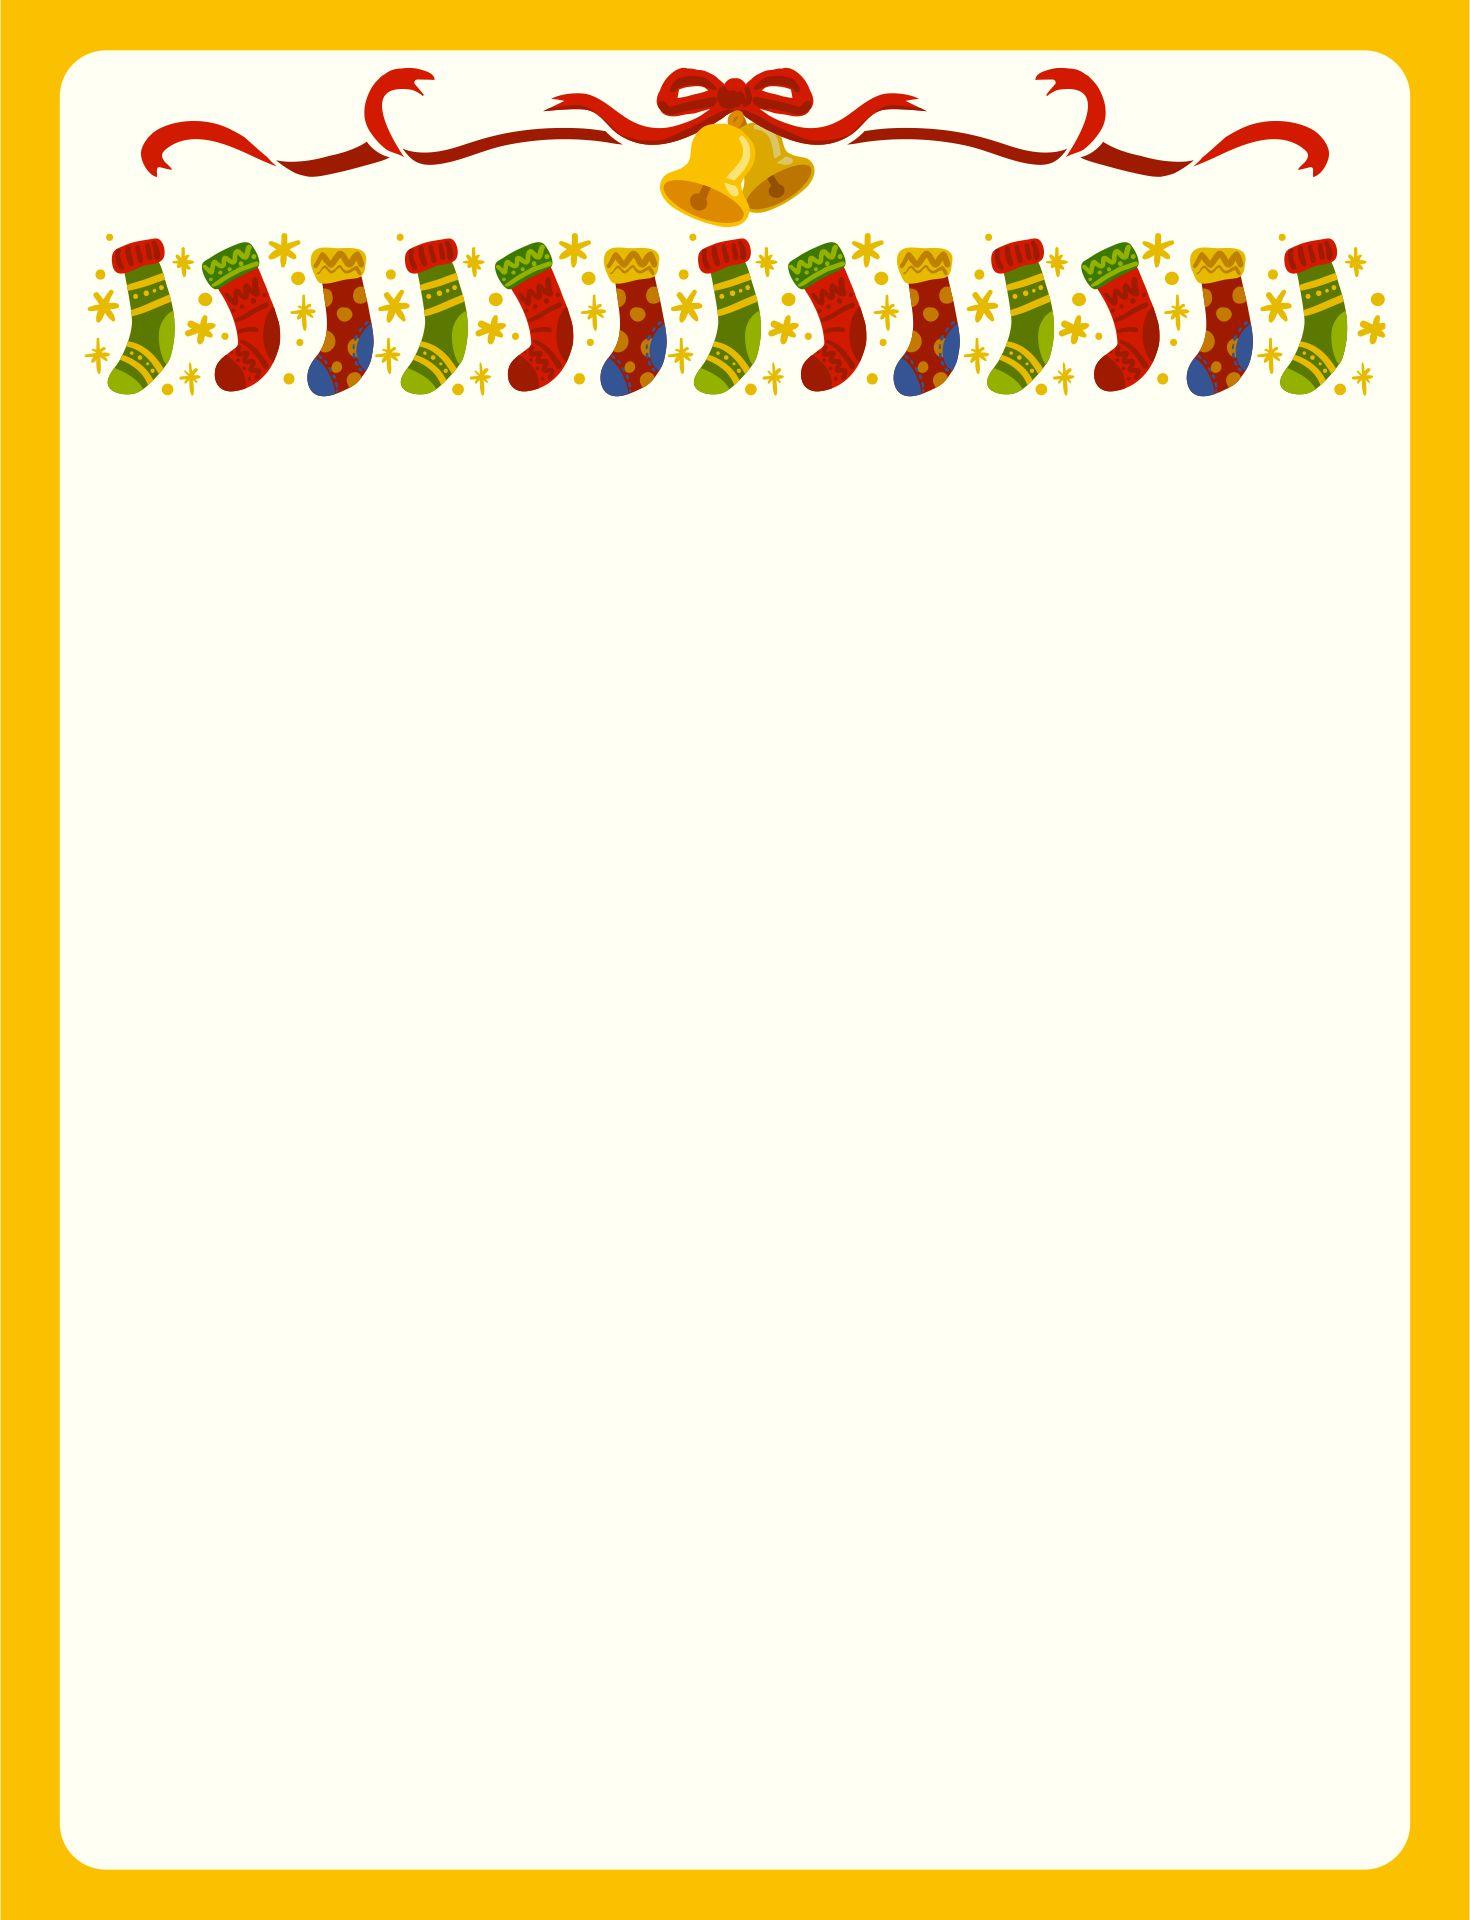 Christmas Paper Border Templates